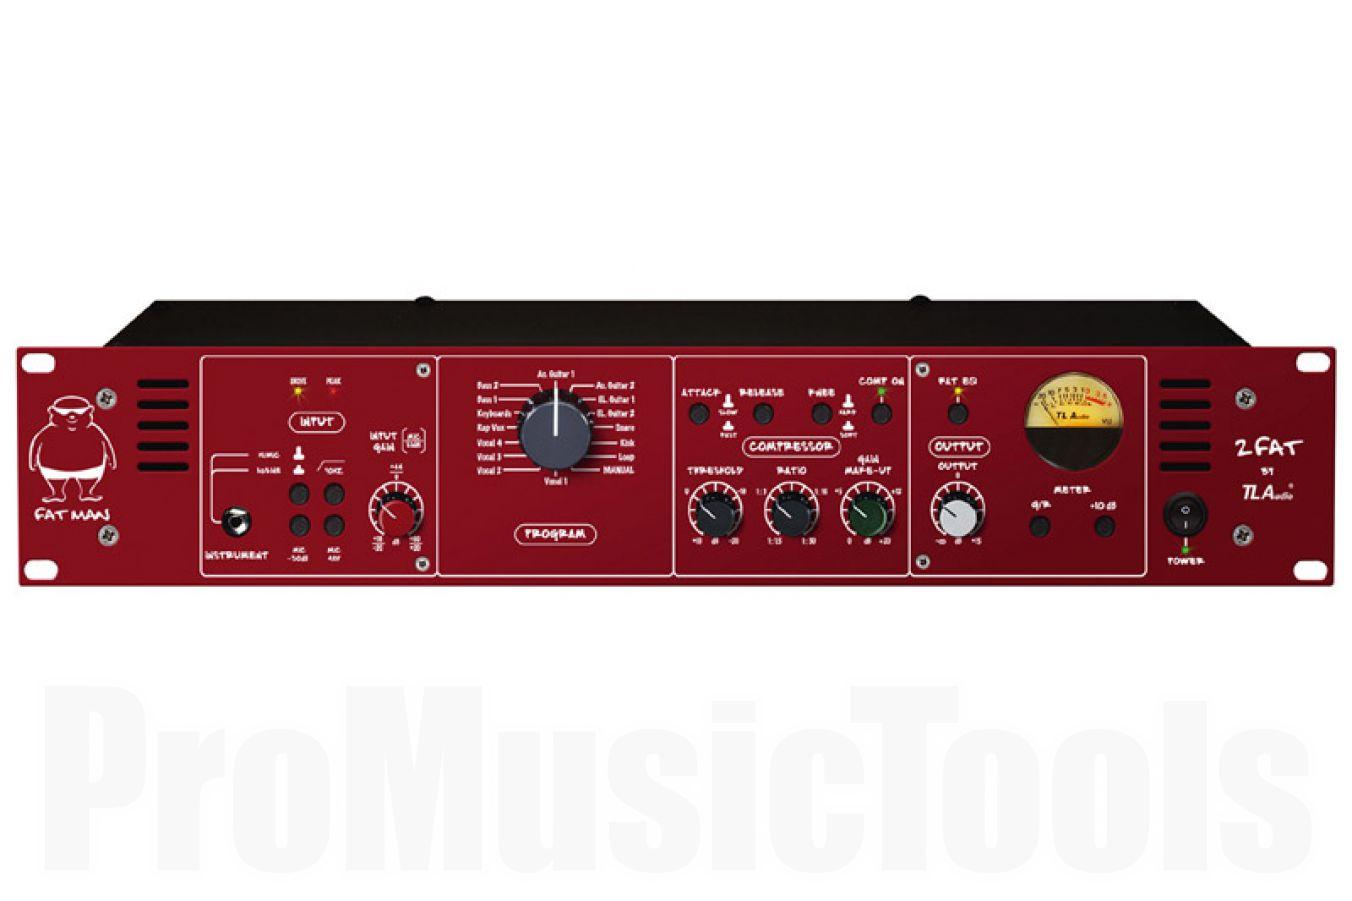 TL Audio 2 Fat - all-valve studio instrument preamp